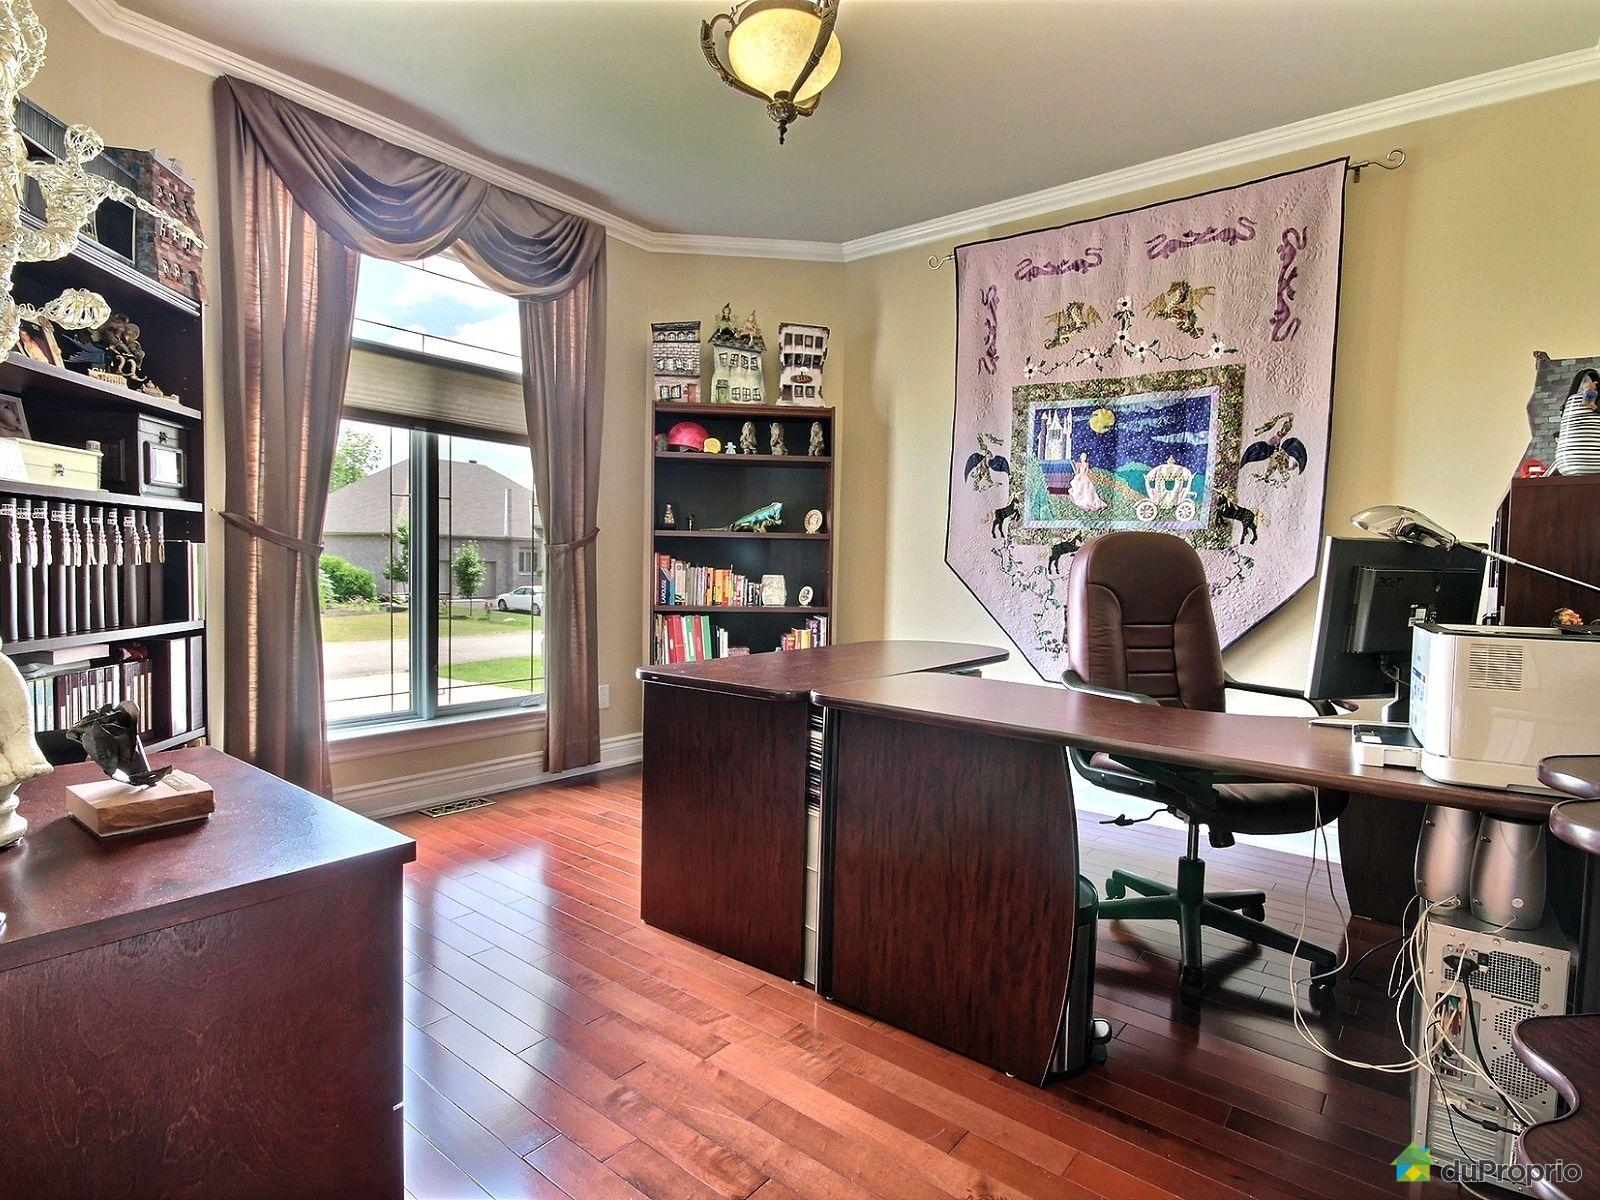 maison-a-vendre-gatineau-aylmer-quebec-province-1600-6353743.jpg